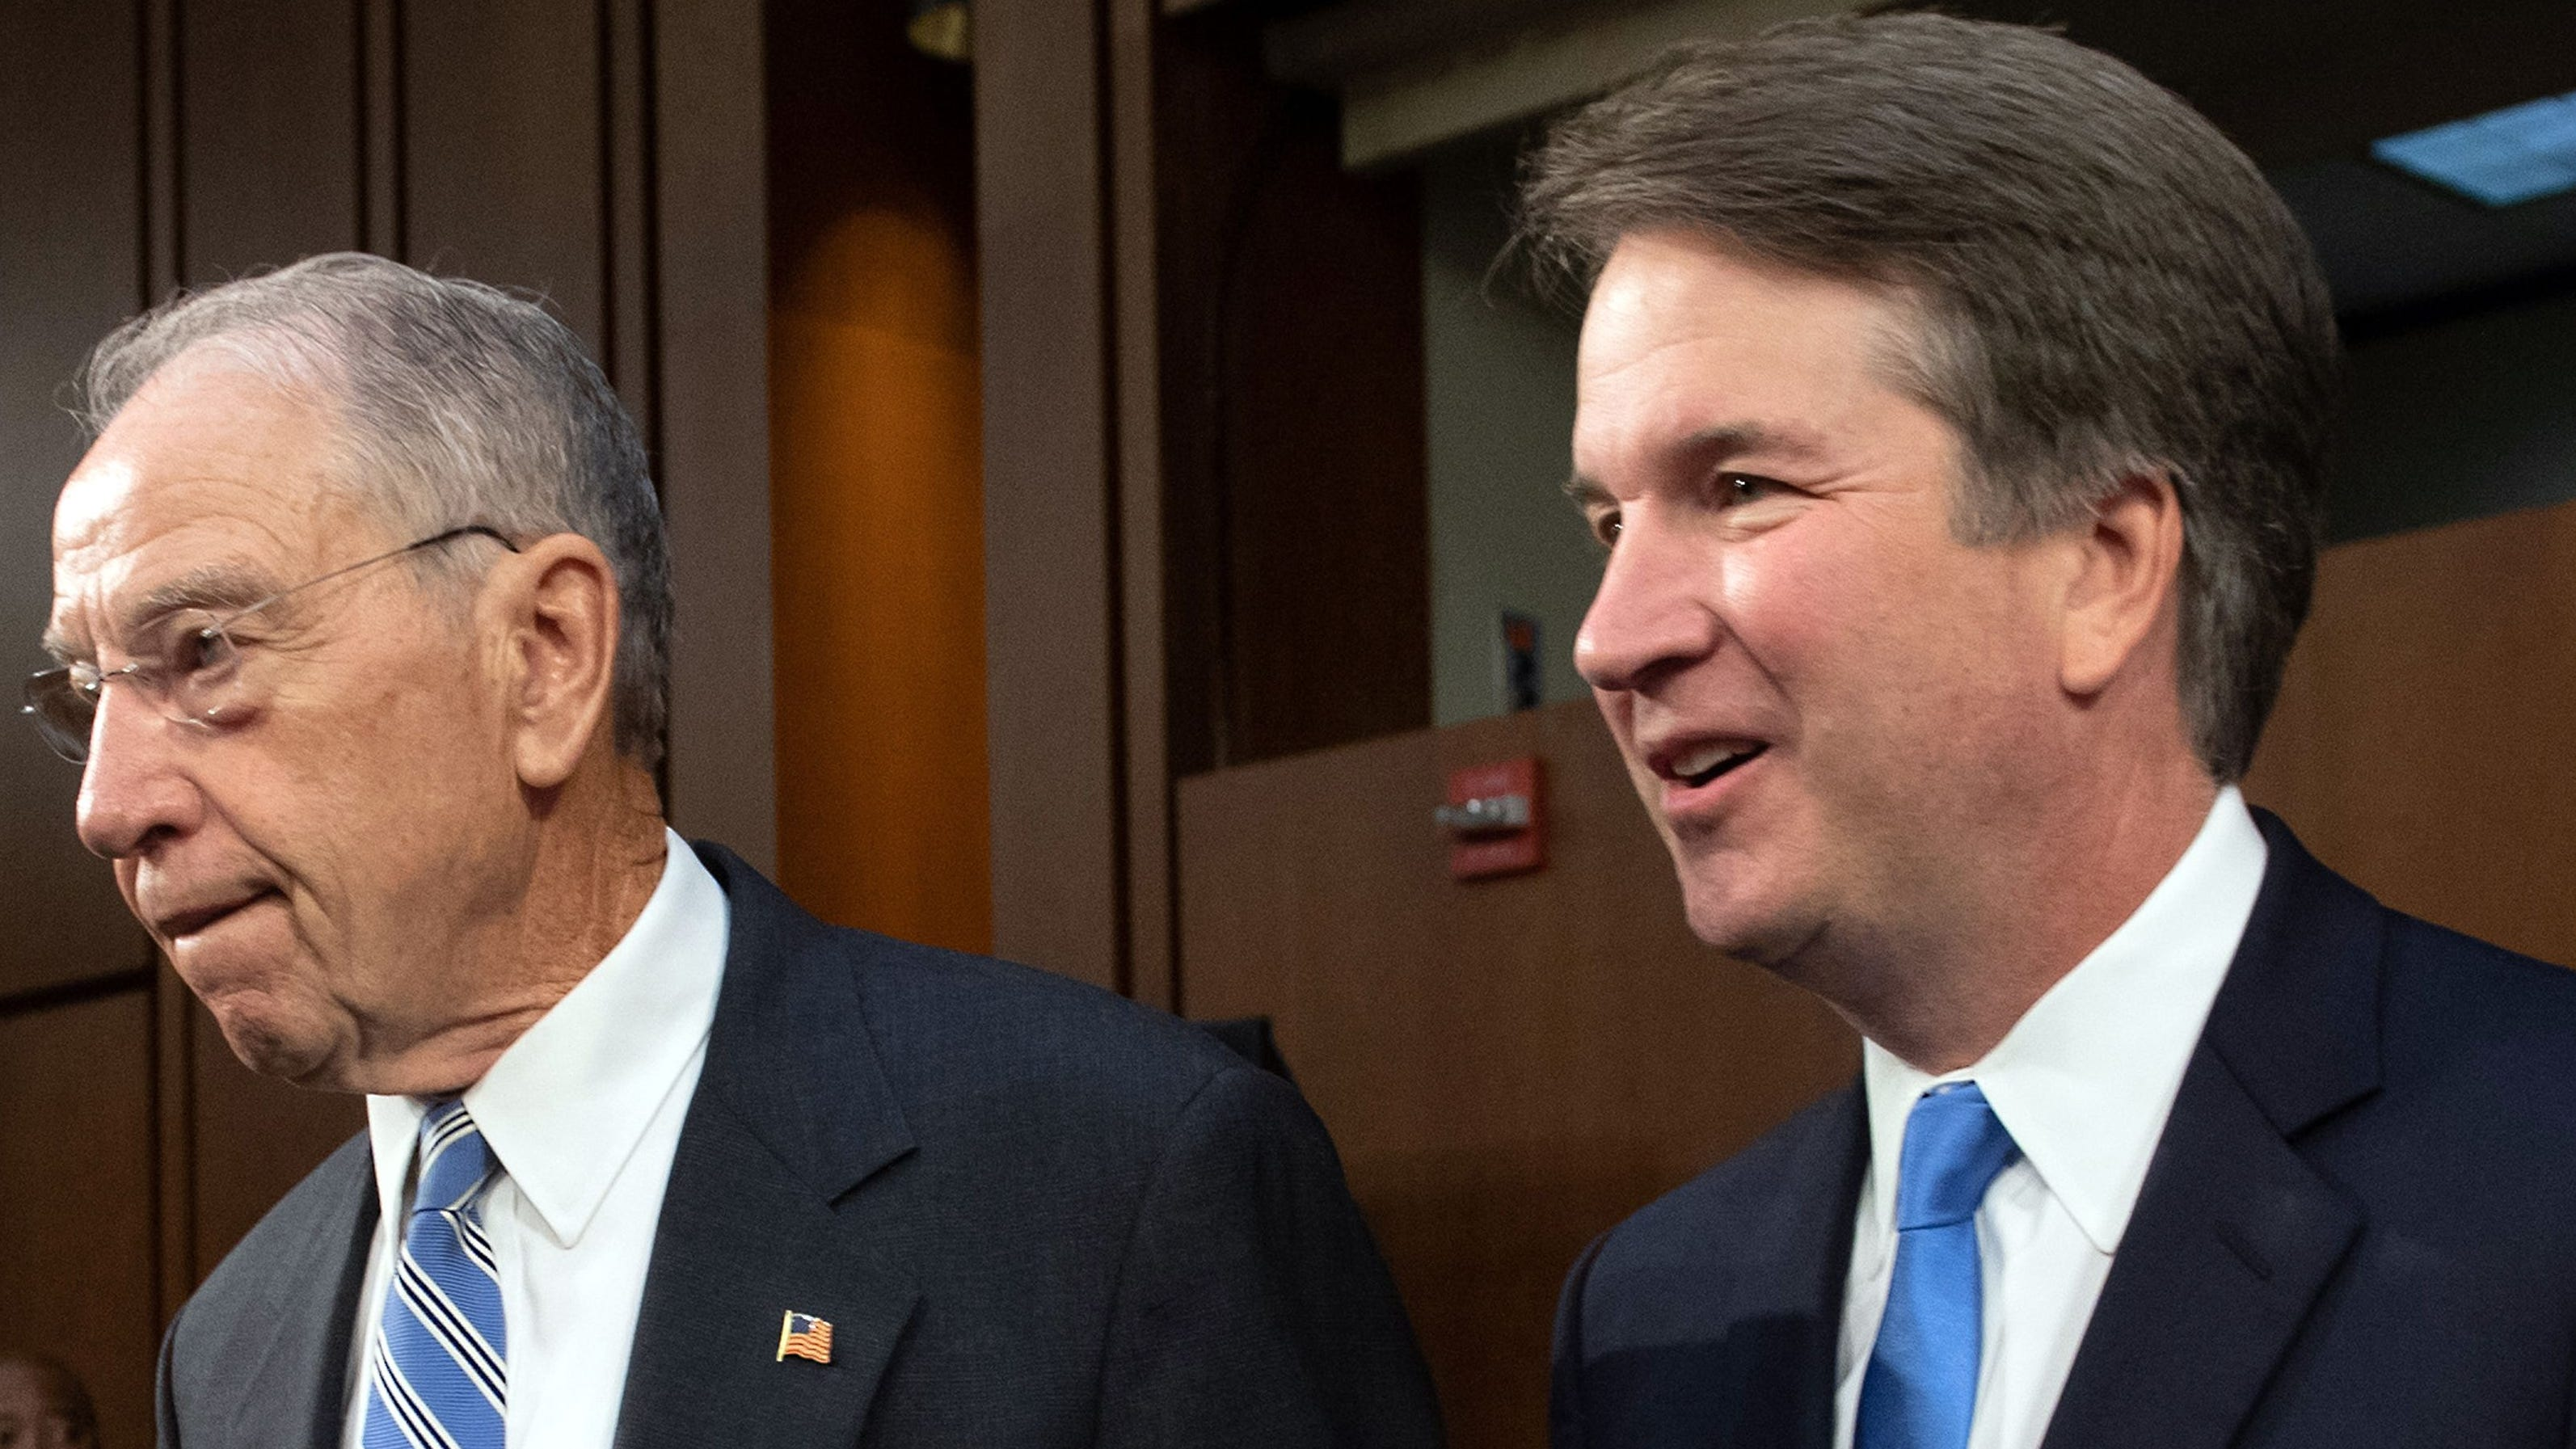 Supreme Court nominee Brett Kavanaugh (right) is pictured walking alongside Sen. Chuck Grassley.